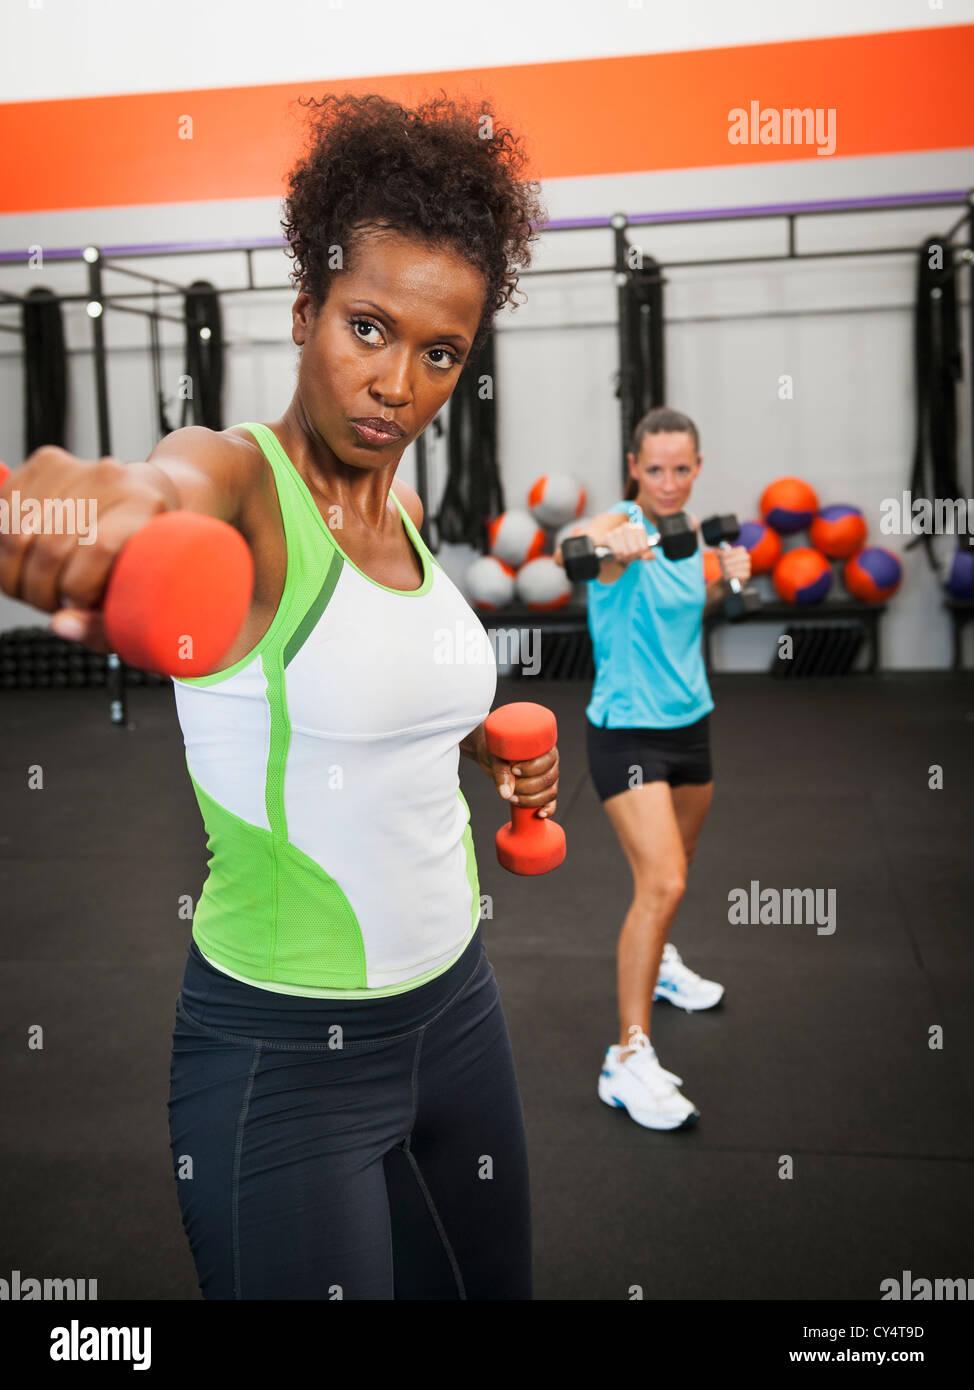 USA, California, Laguna Niguel, Two mid adult women exercising with dumbbells - Stock Image